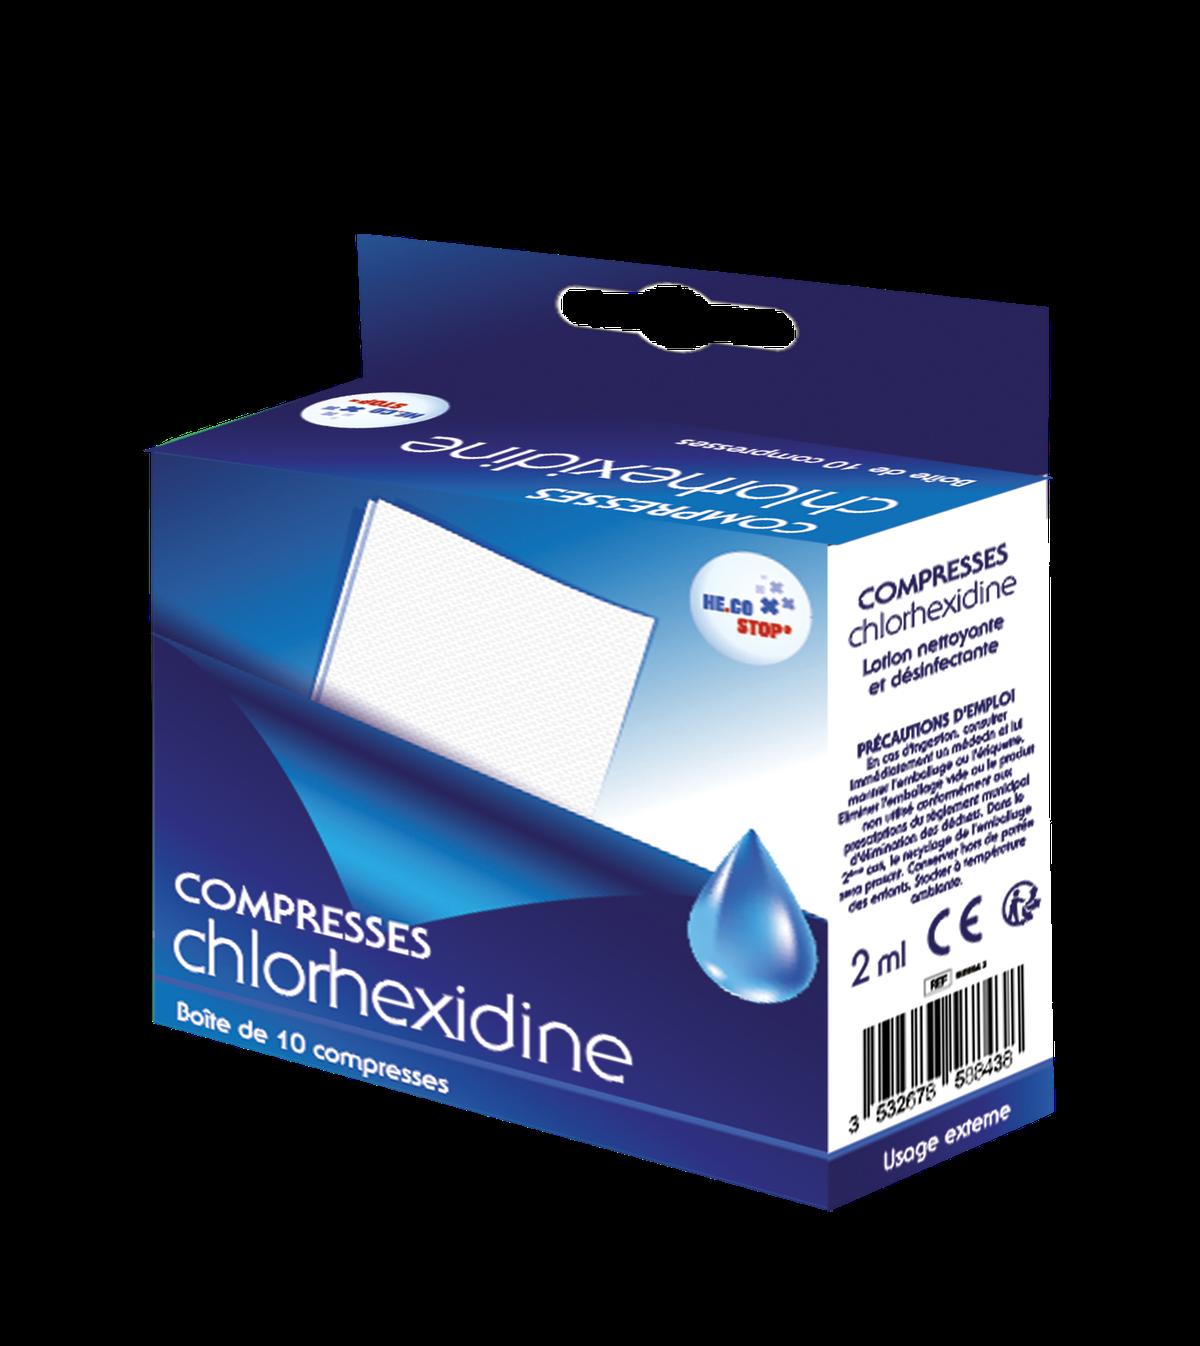 Compresses Chlorhexidine x10